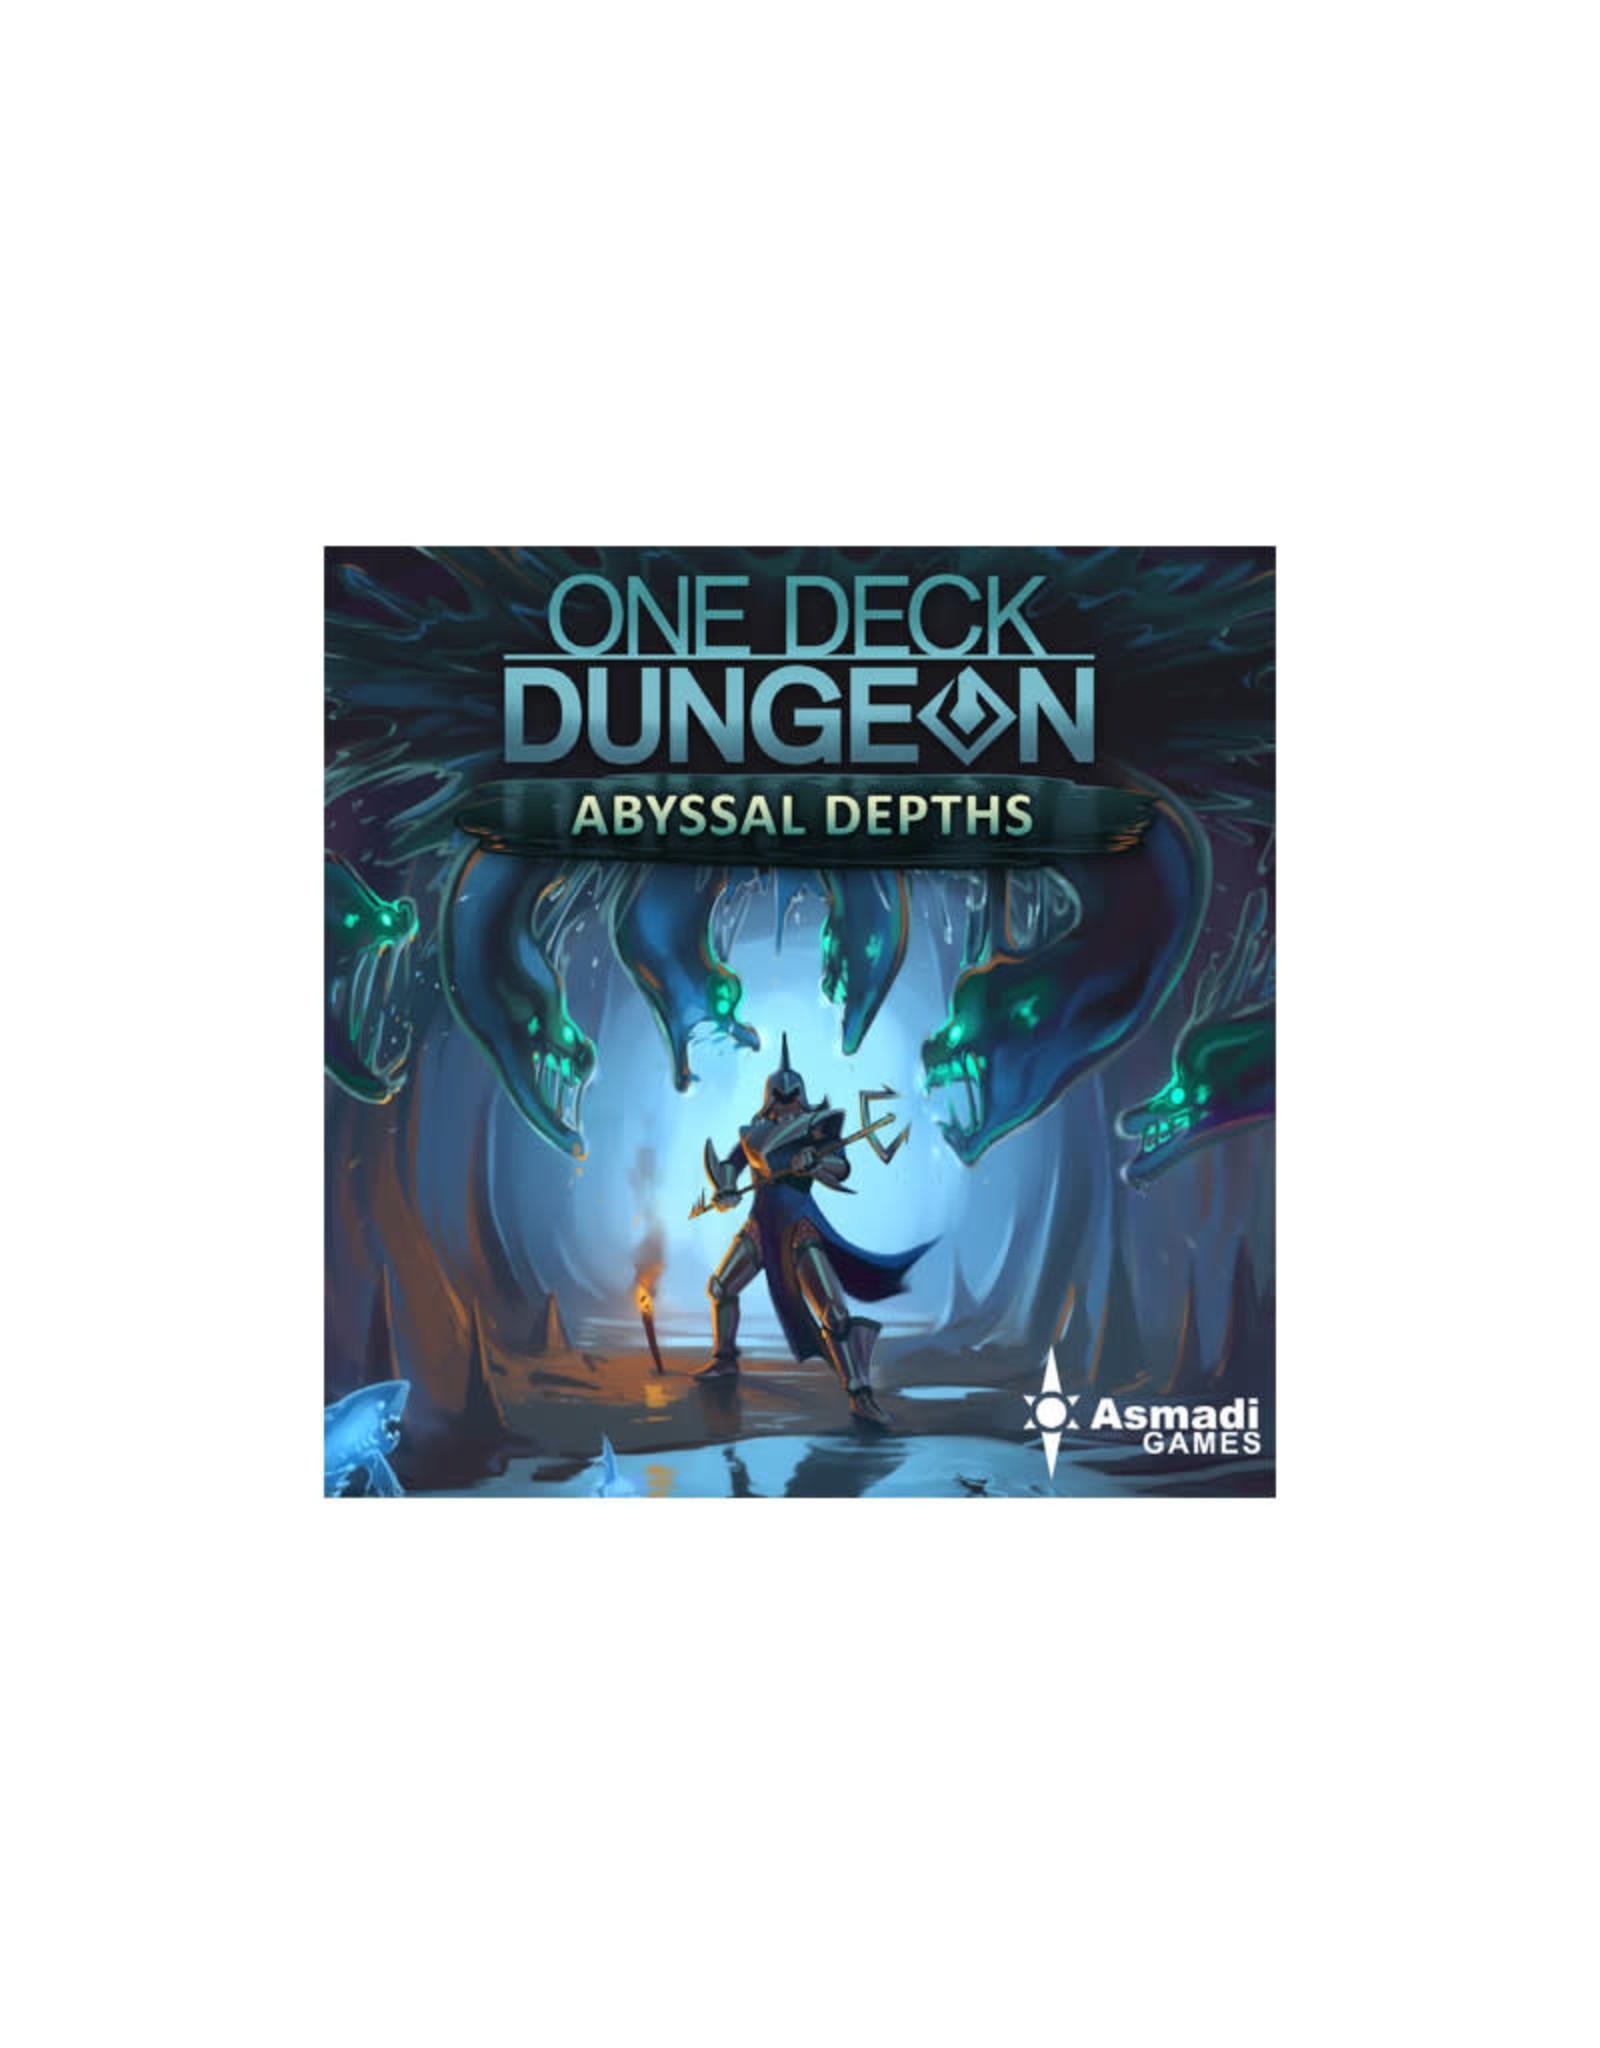 Asmadi Games One Deck Dungeon: Abyssal Depths